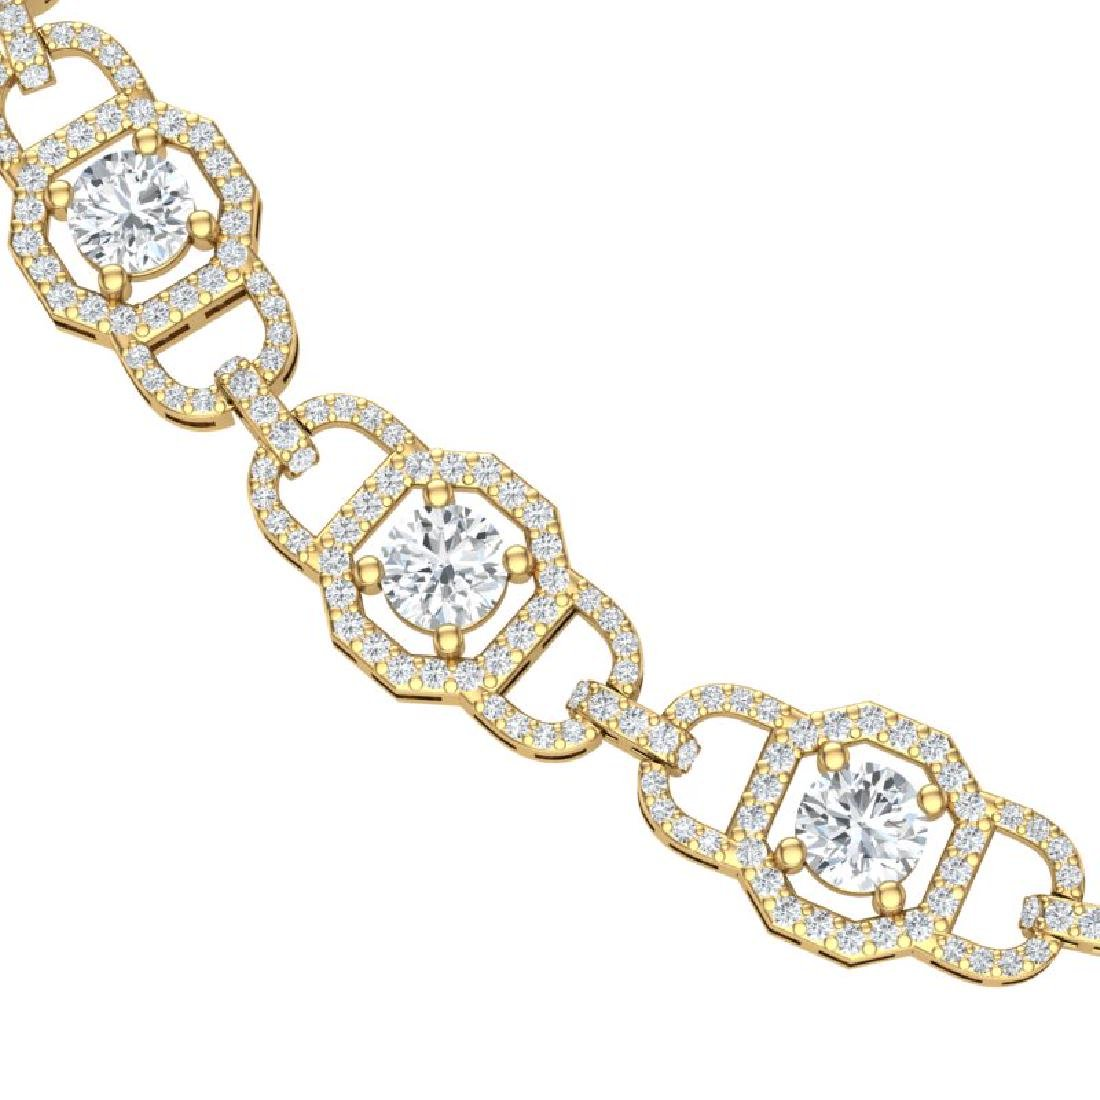 25 CTW Certified SI/I Diamond Halo Necklace 18K Yellow - 2